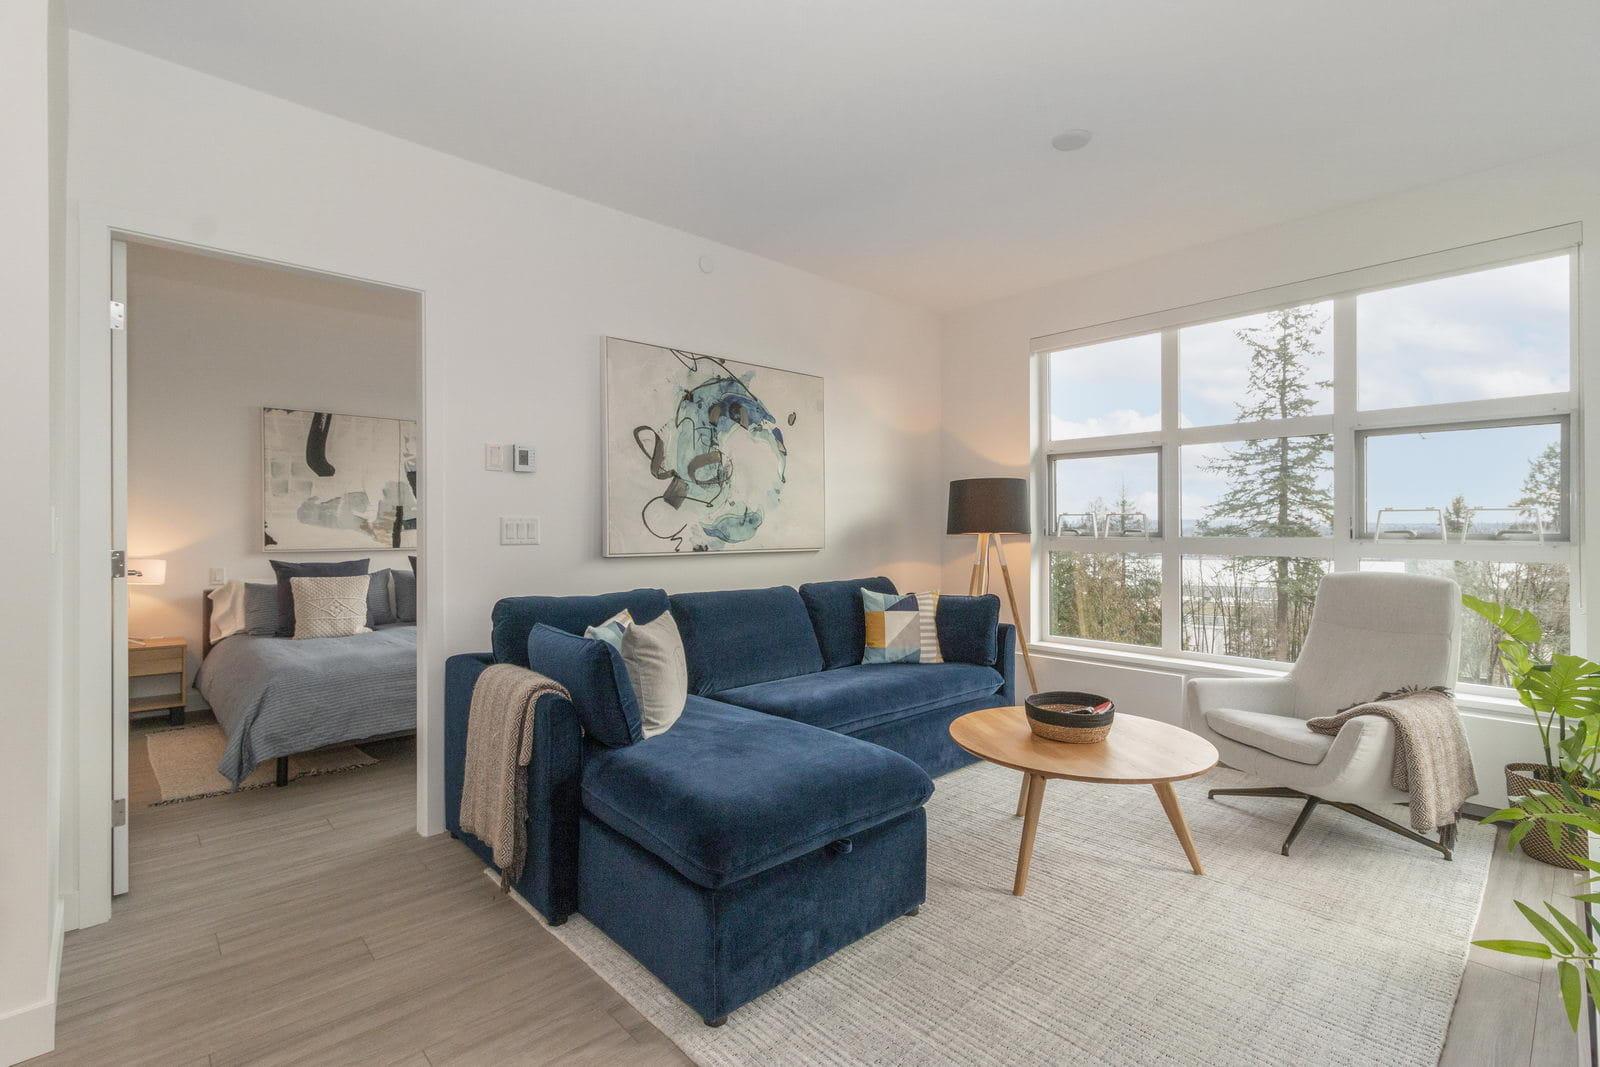 Living Room in Montreal rental